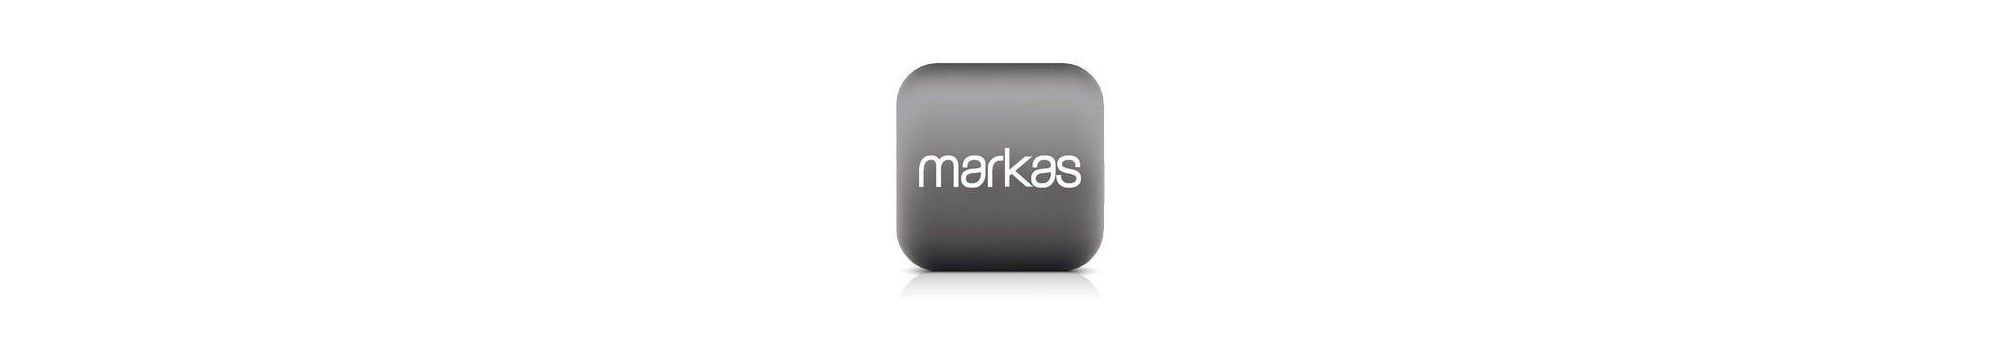 Markas